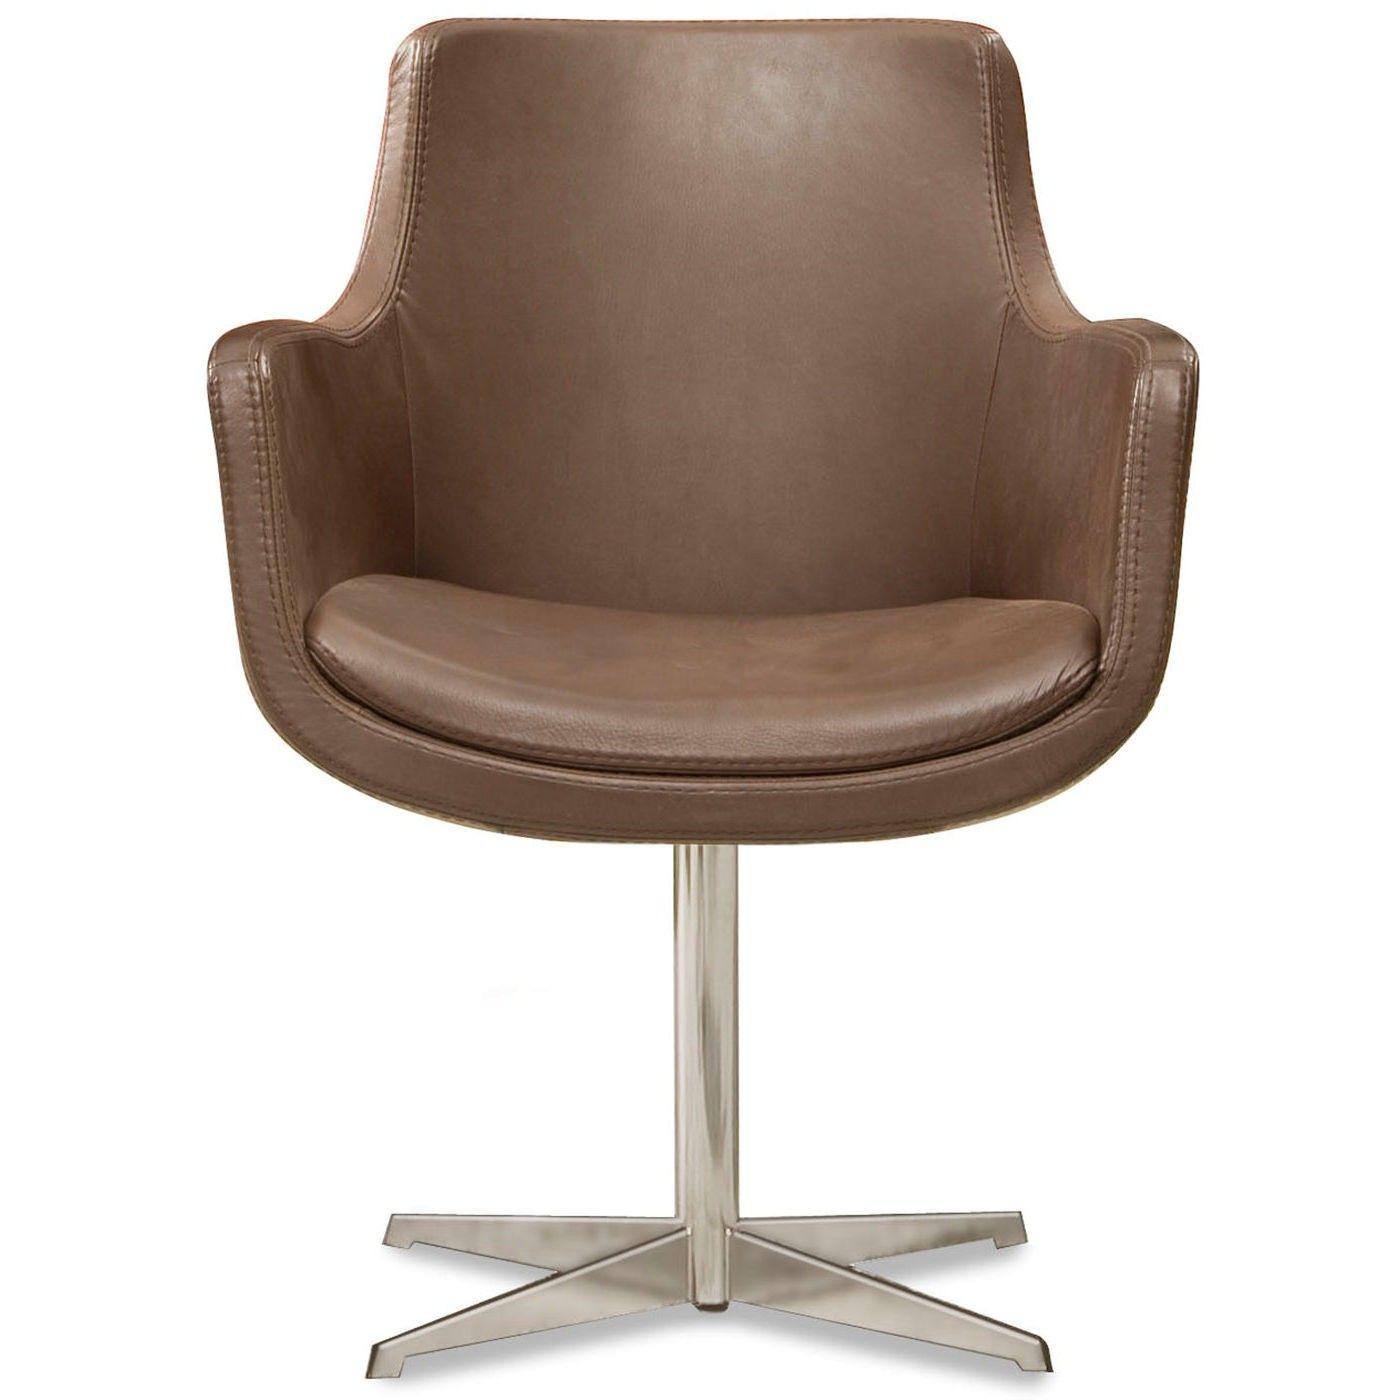 Armlehnstuhl Bella Leder Kare Design Armlehnstuhl Leder Armlehnstuhl Stuhle